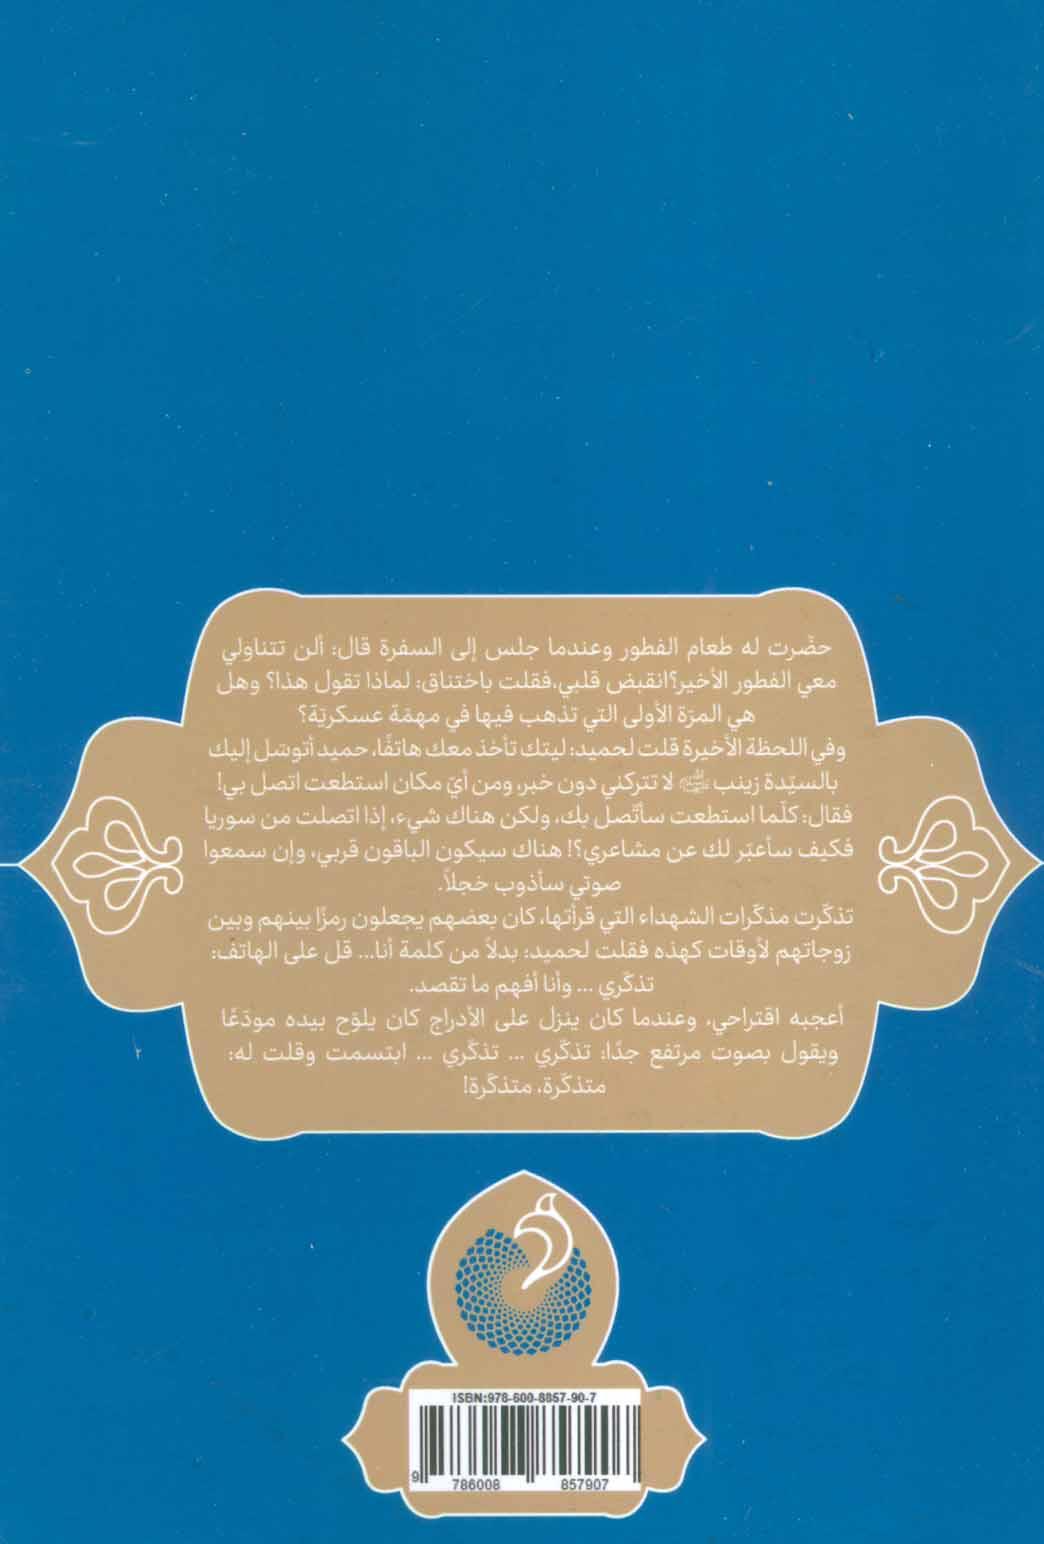 تذکری…:قصه الشهید المدافع عن حرم اهل بیت (حکایه الصالحین 7)،(عربی)،(تک زبانه)